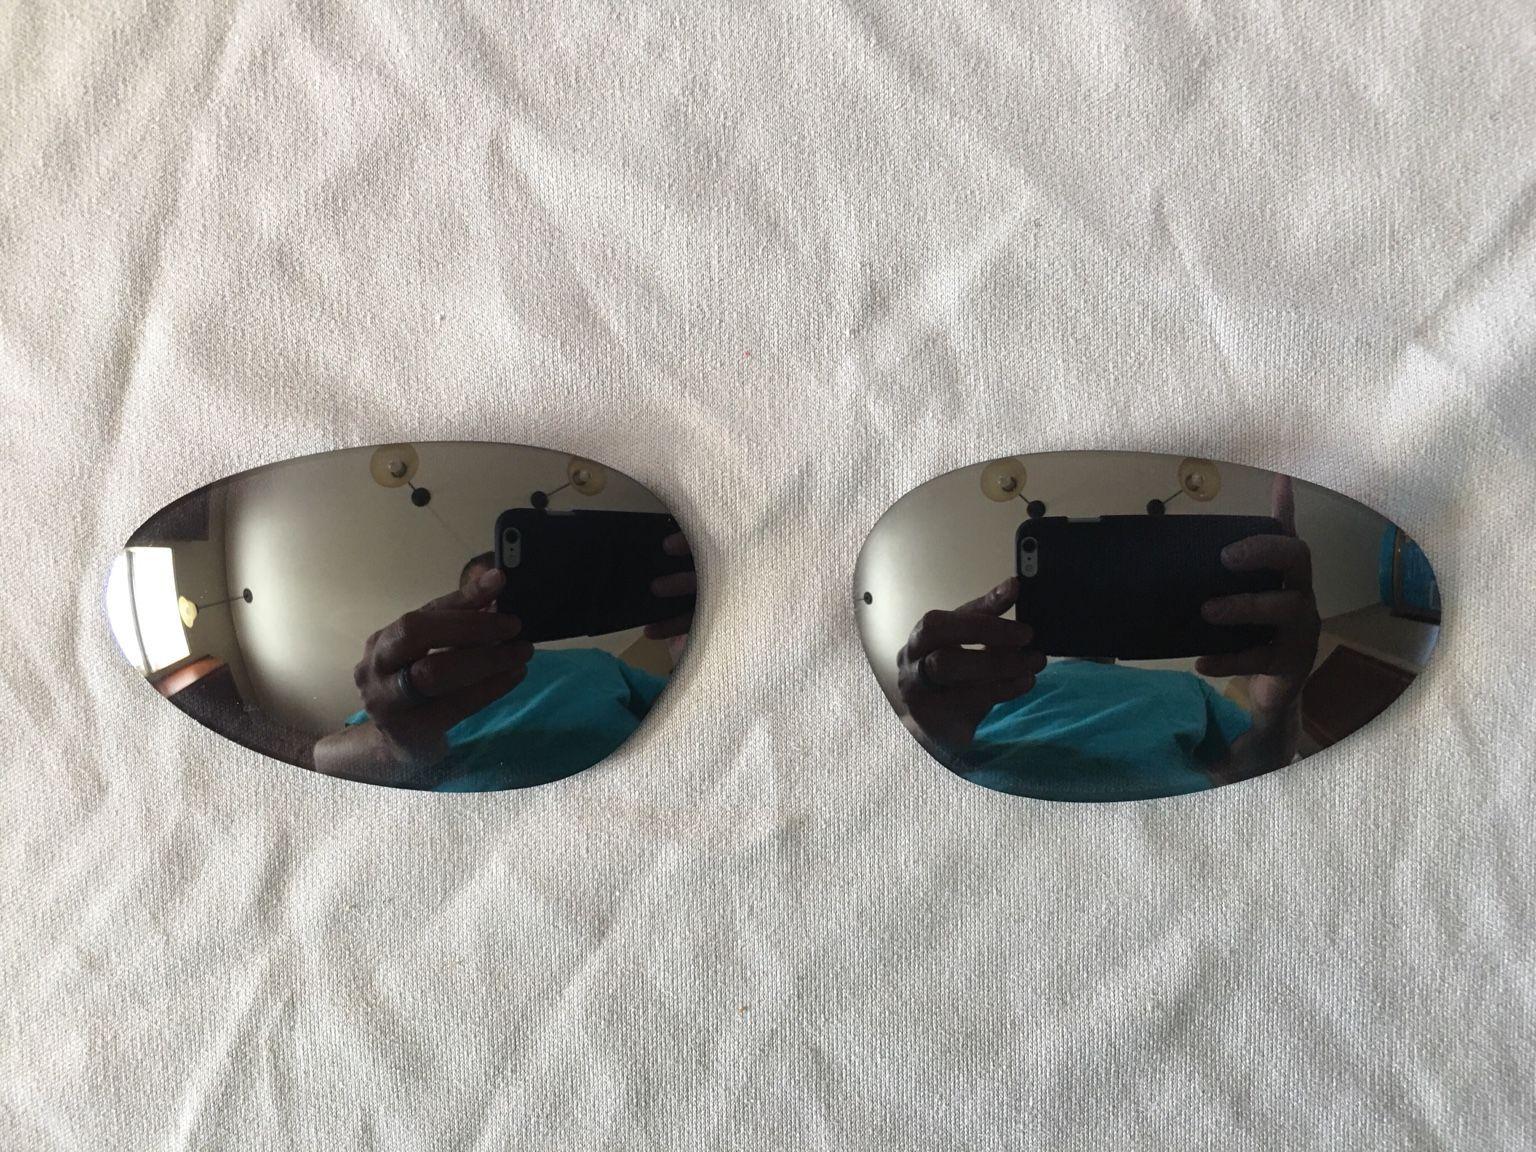 Minute Lenses ****Price Drop - 42d19c30f976b7fdf7d262787663e8e7.jpg